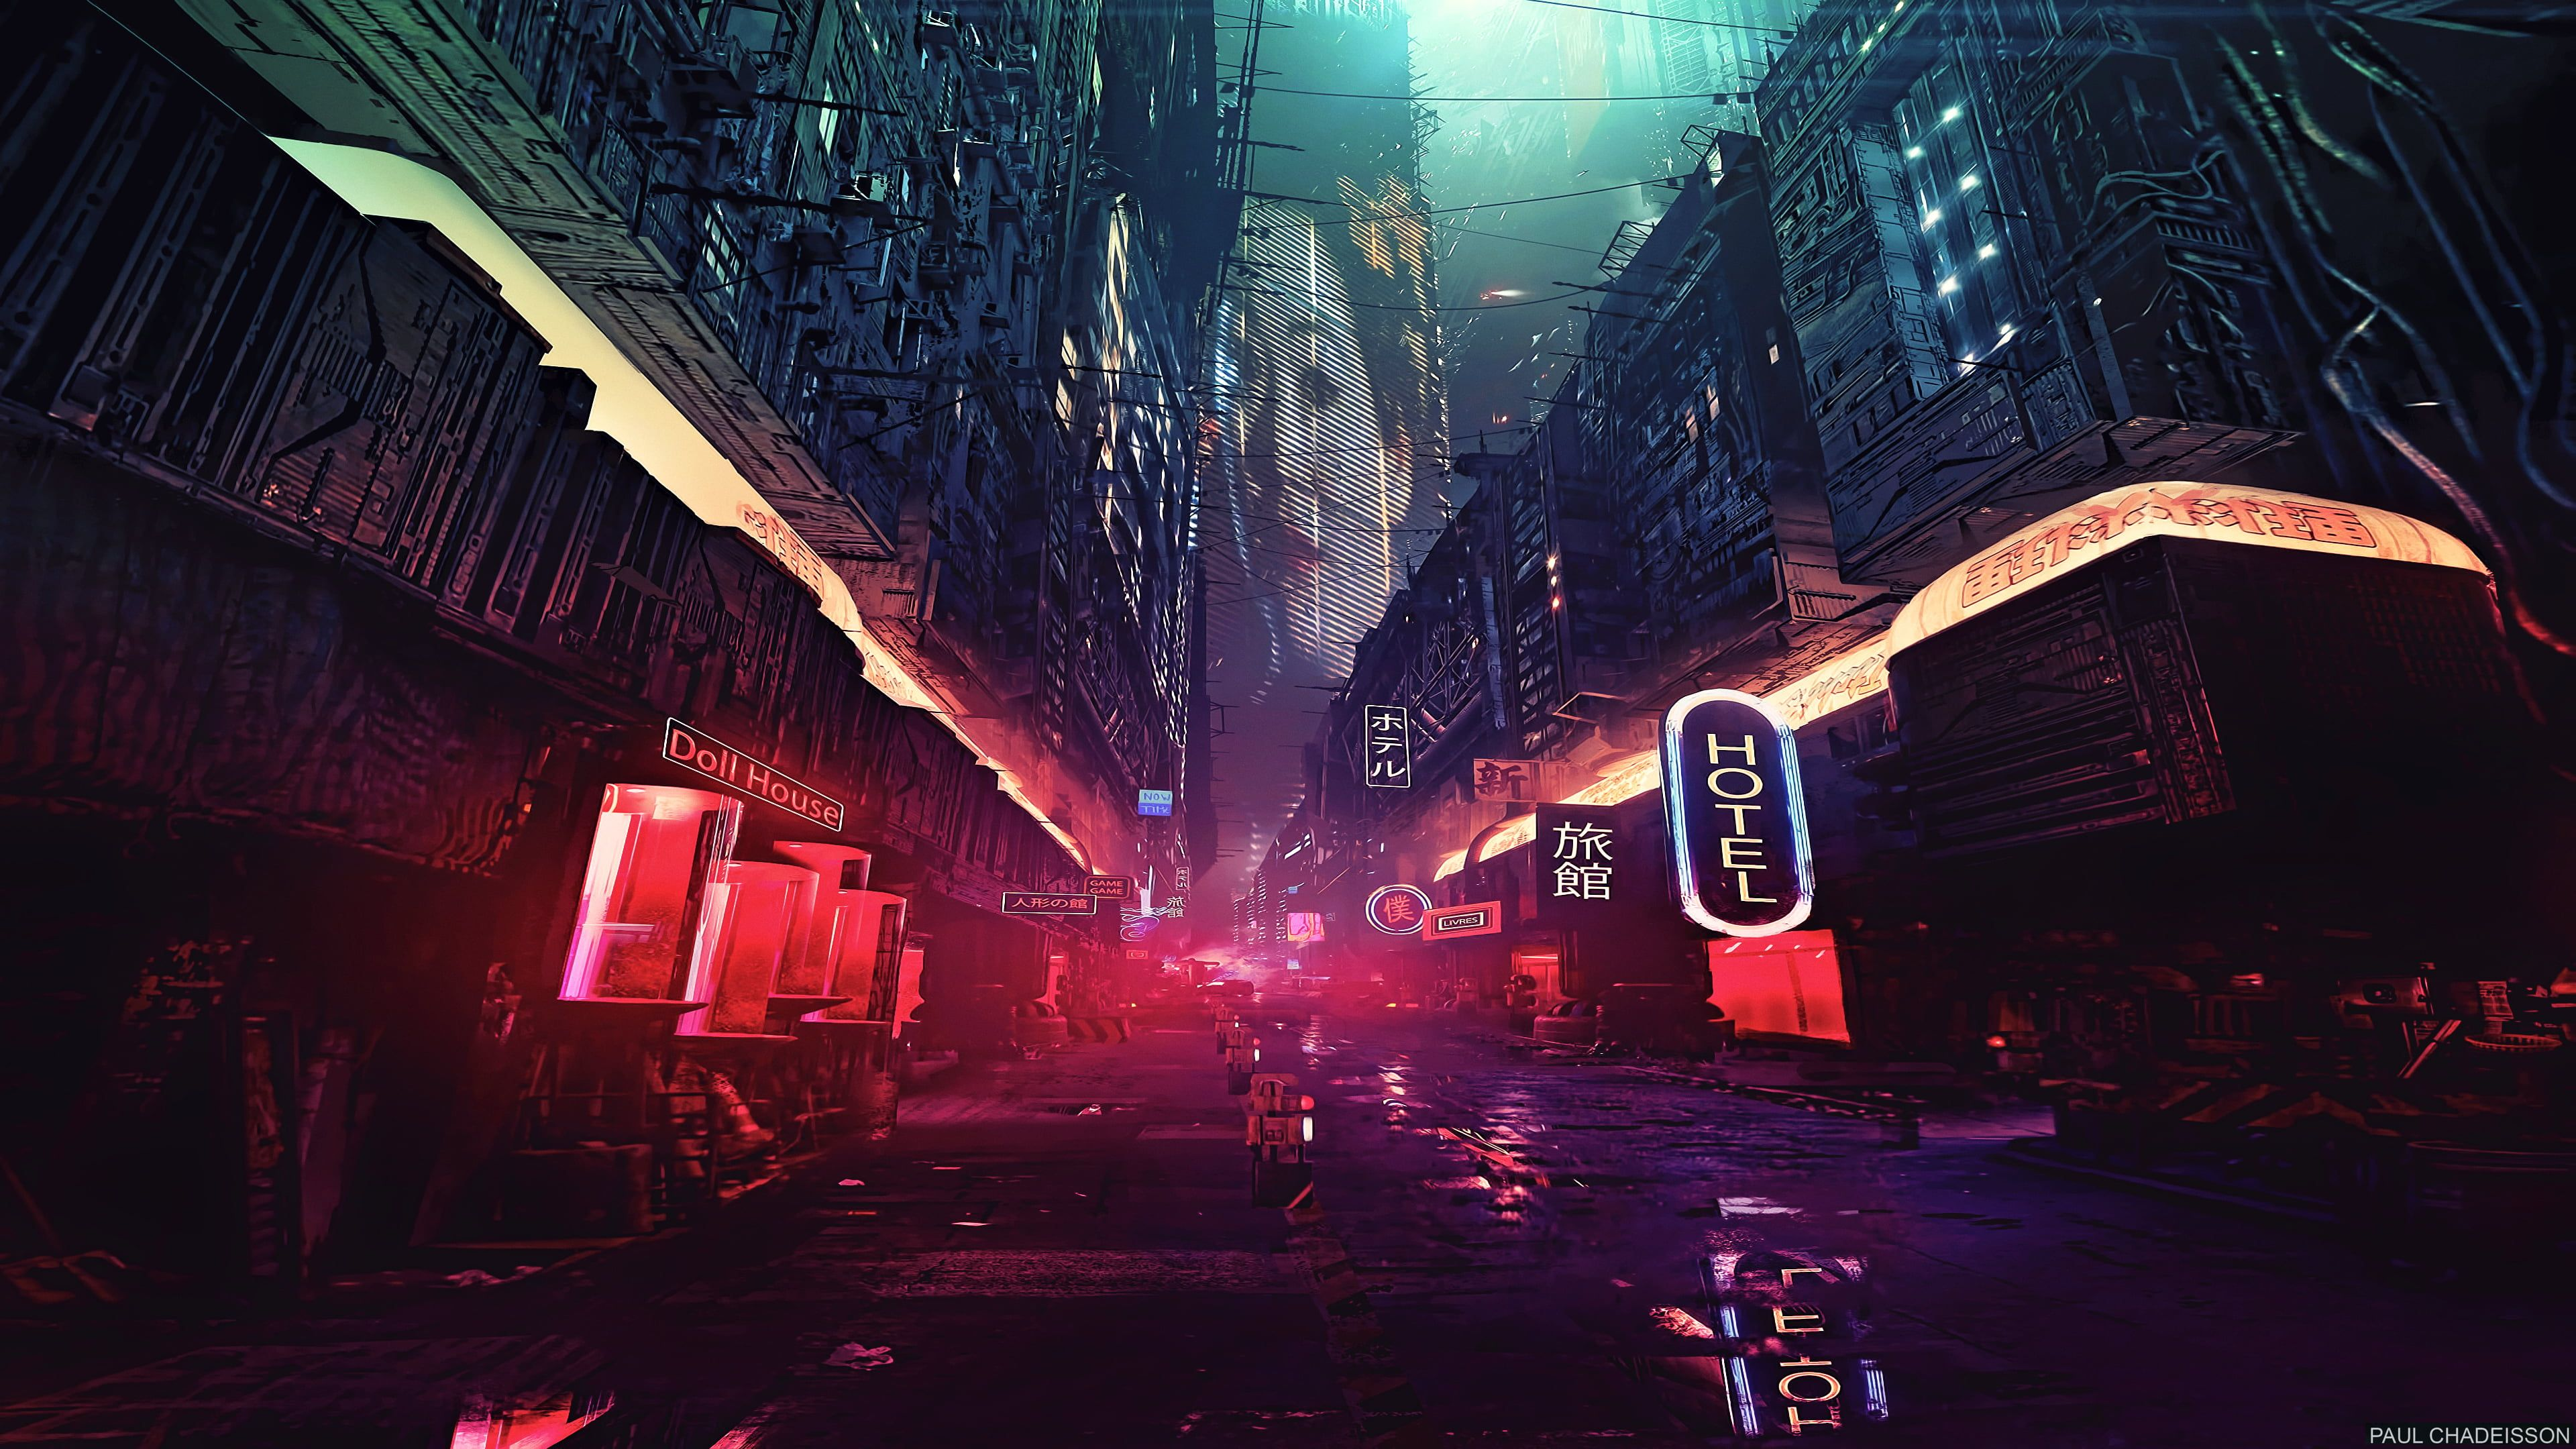 Lighted Building Illustration Movie Scene Night Artwork Futuristic City Cyberpunk Cyber Science Fictio Futuristic City Building Illustration Art Wallpaper